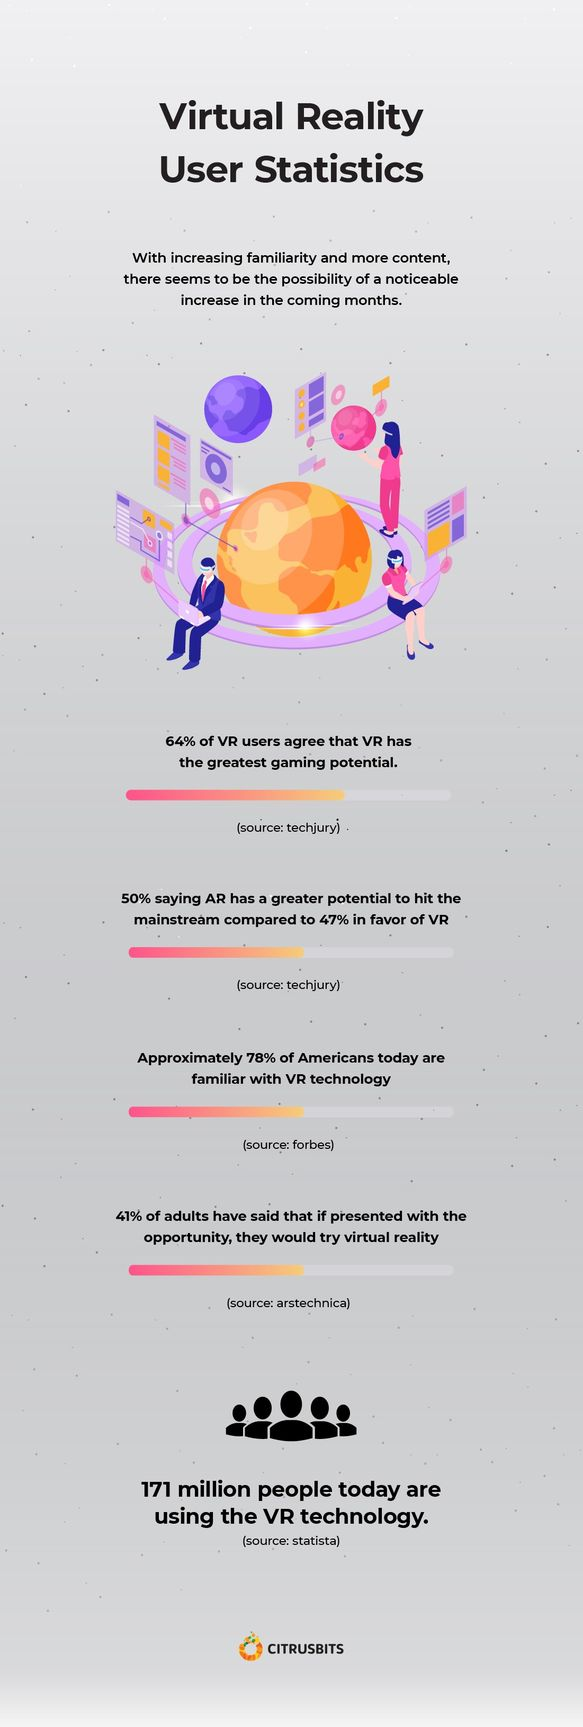 VR user statistics